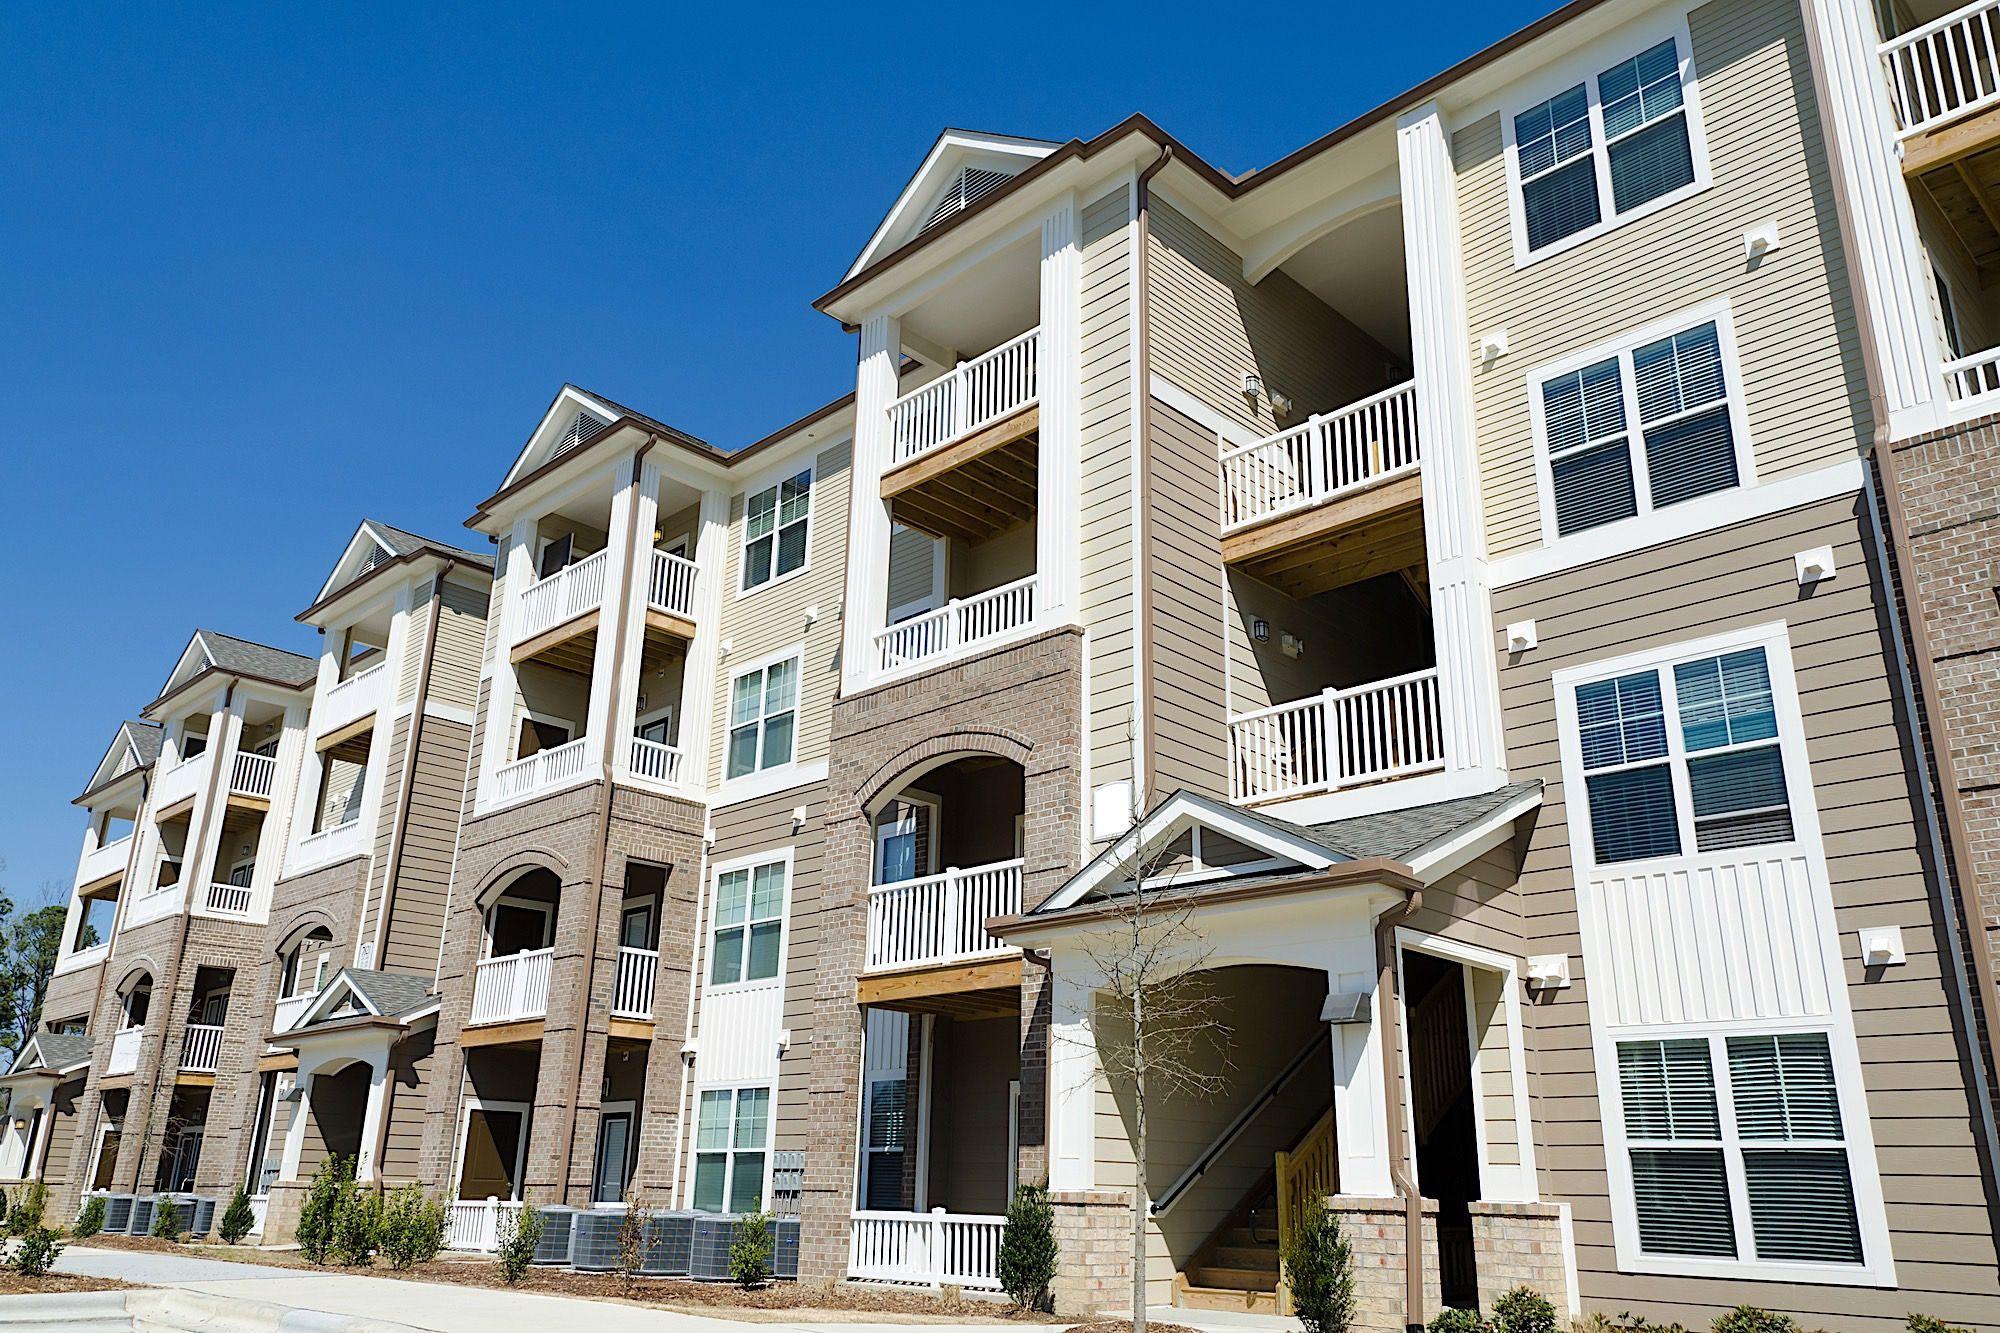 How To Start A Rental Property Business Like A Pro By Jd Esajian Jdesajian Key Takeaways Learning In 2020 Apartment Complexes Travel Nursing Travel Nurse Housing